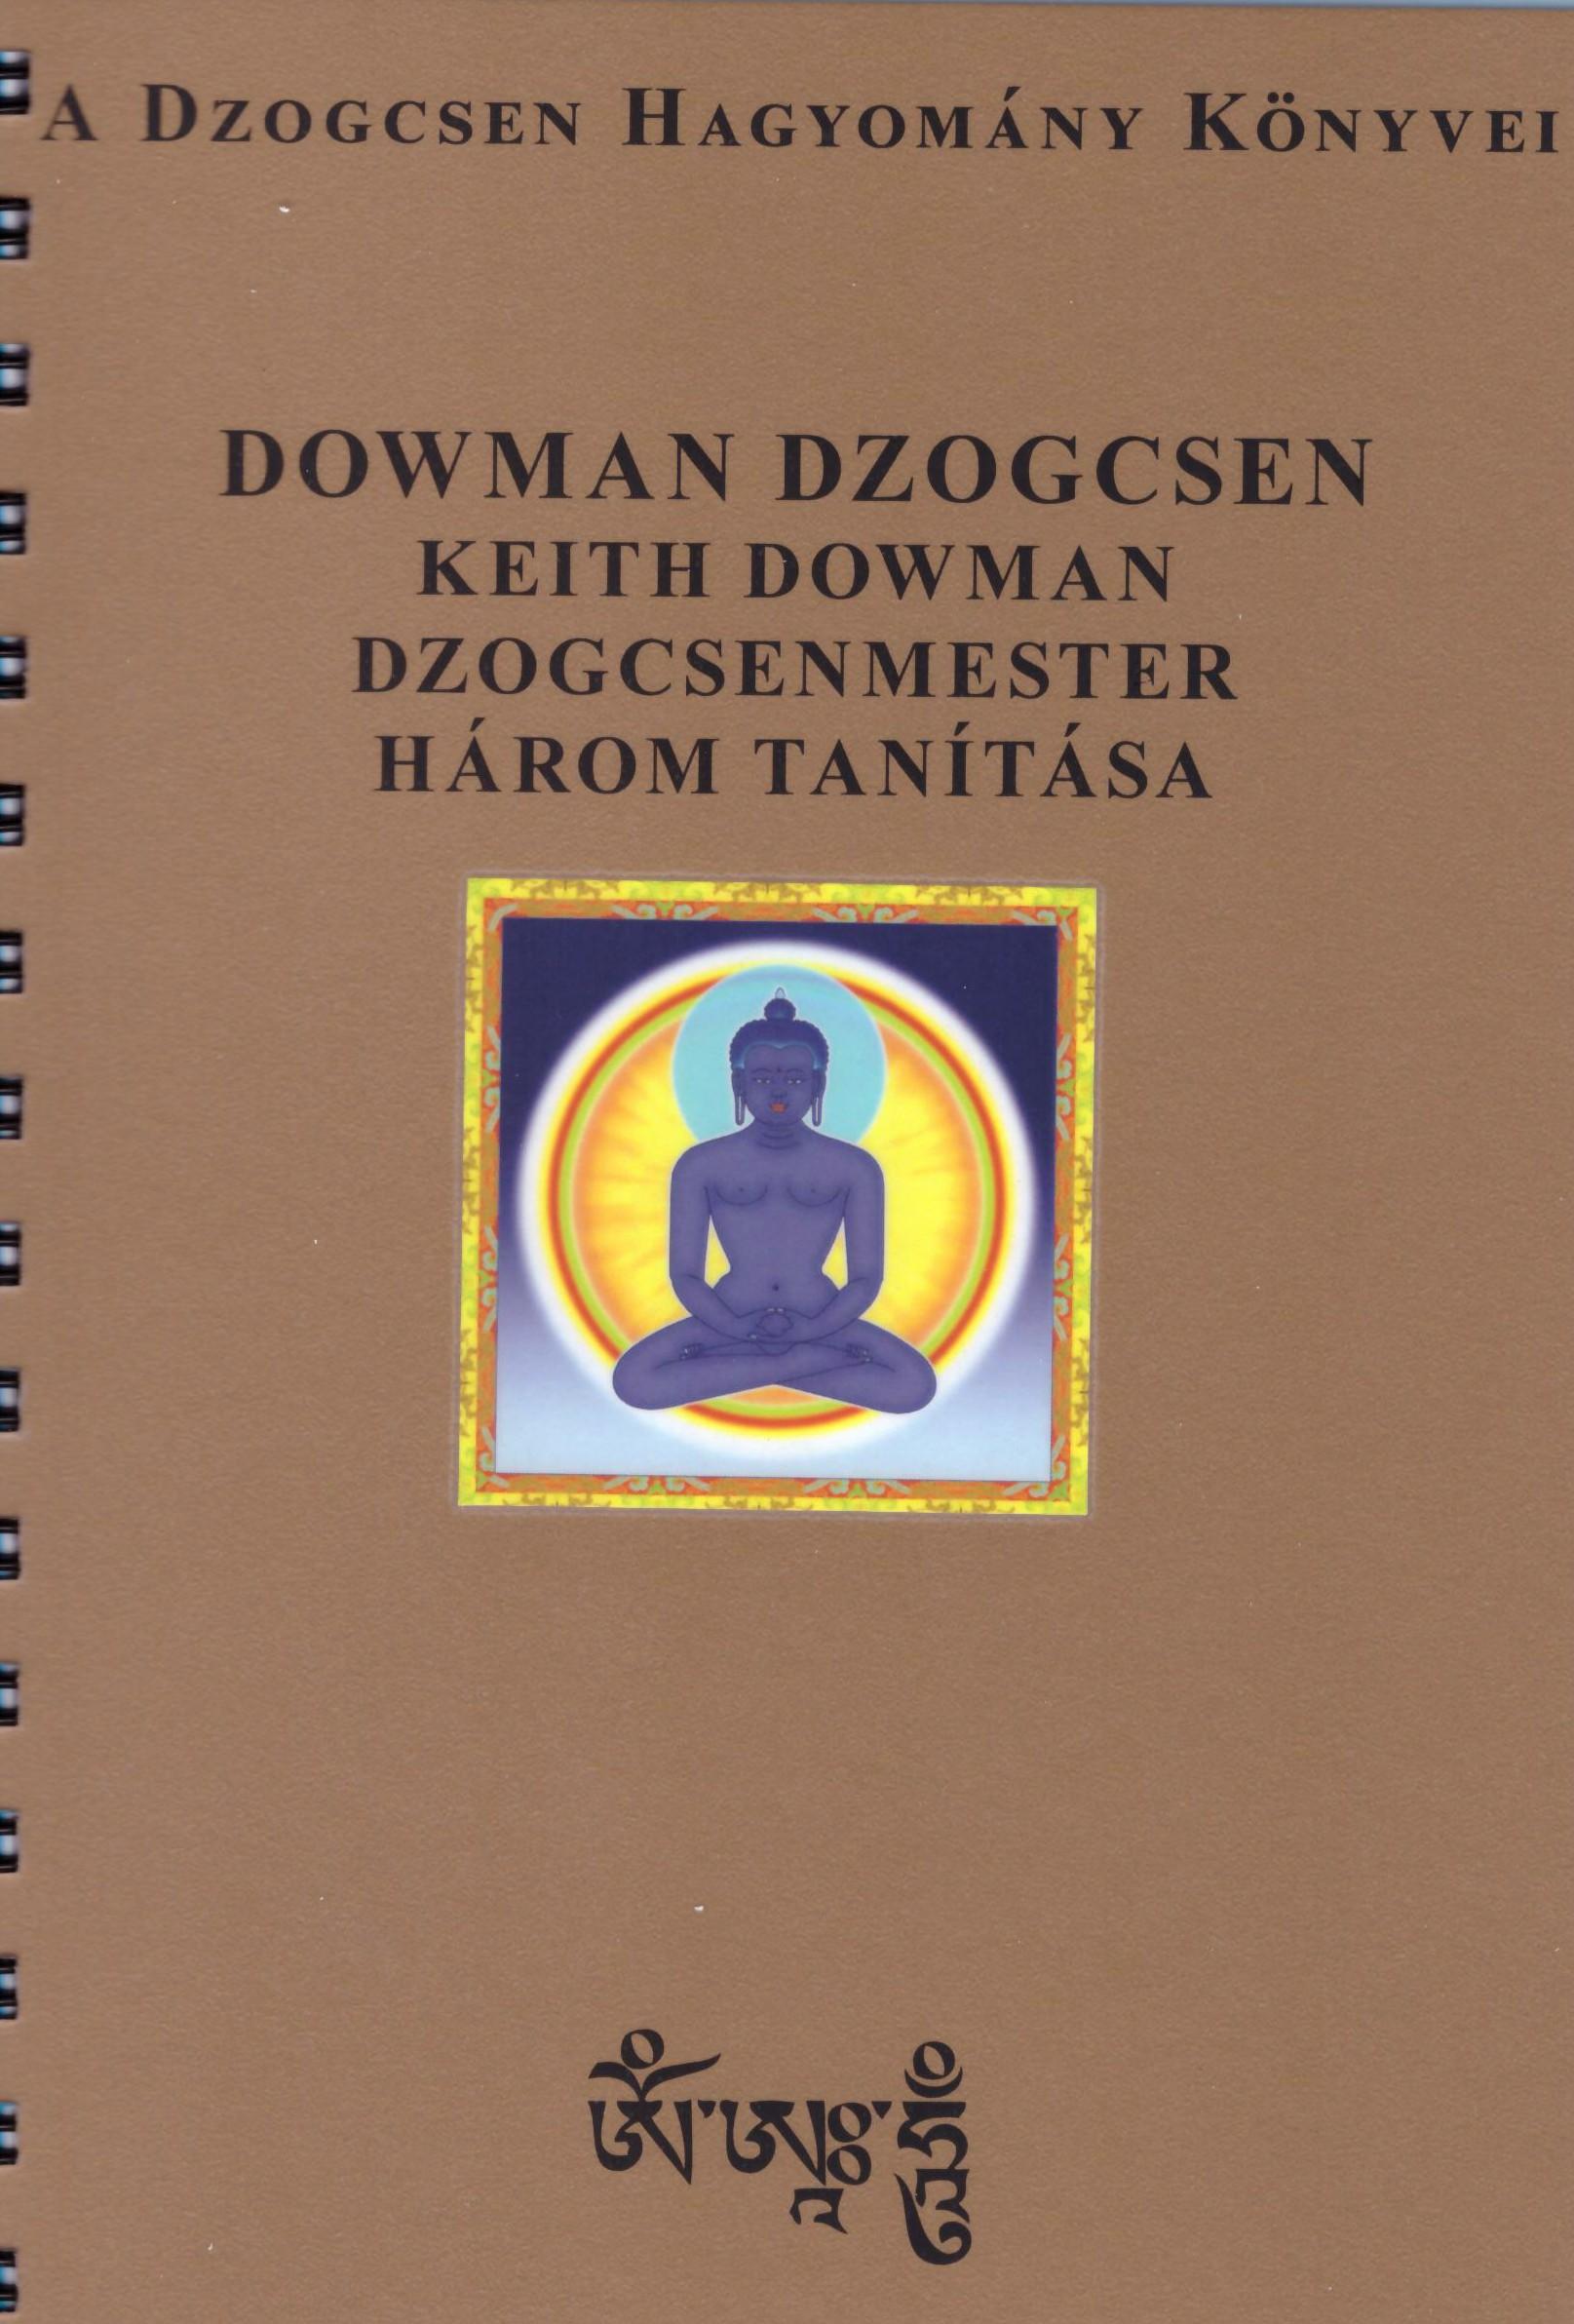 Dowman Dzogcsen